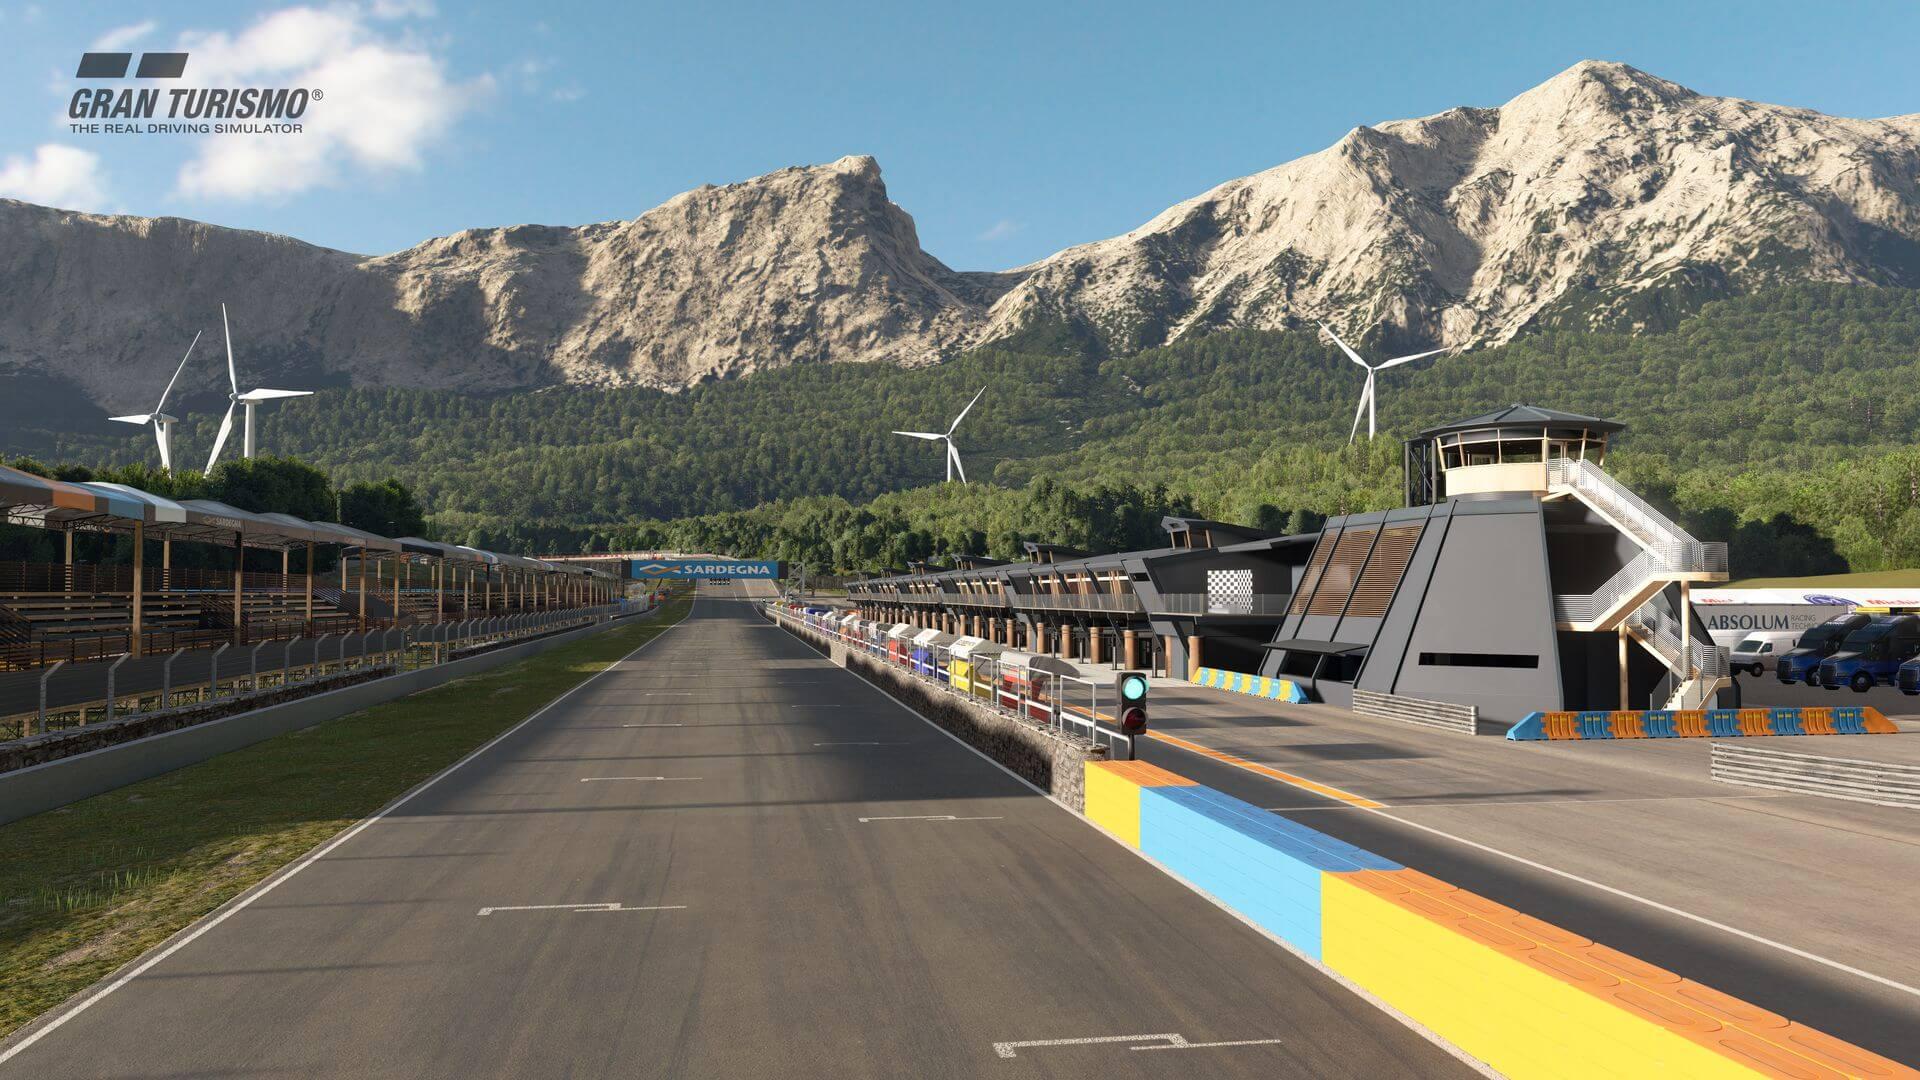 GT Sport Update 1.40 Arrives June 27, Adds Sardegna